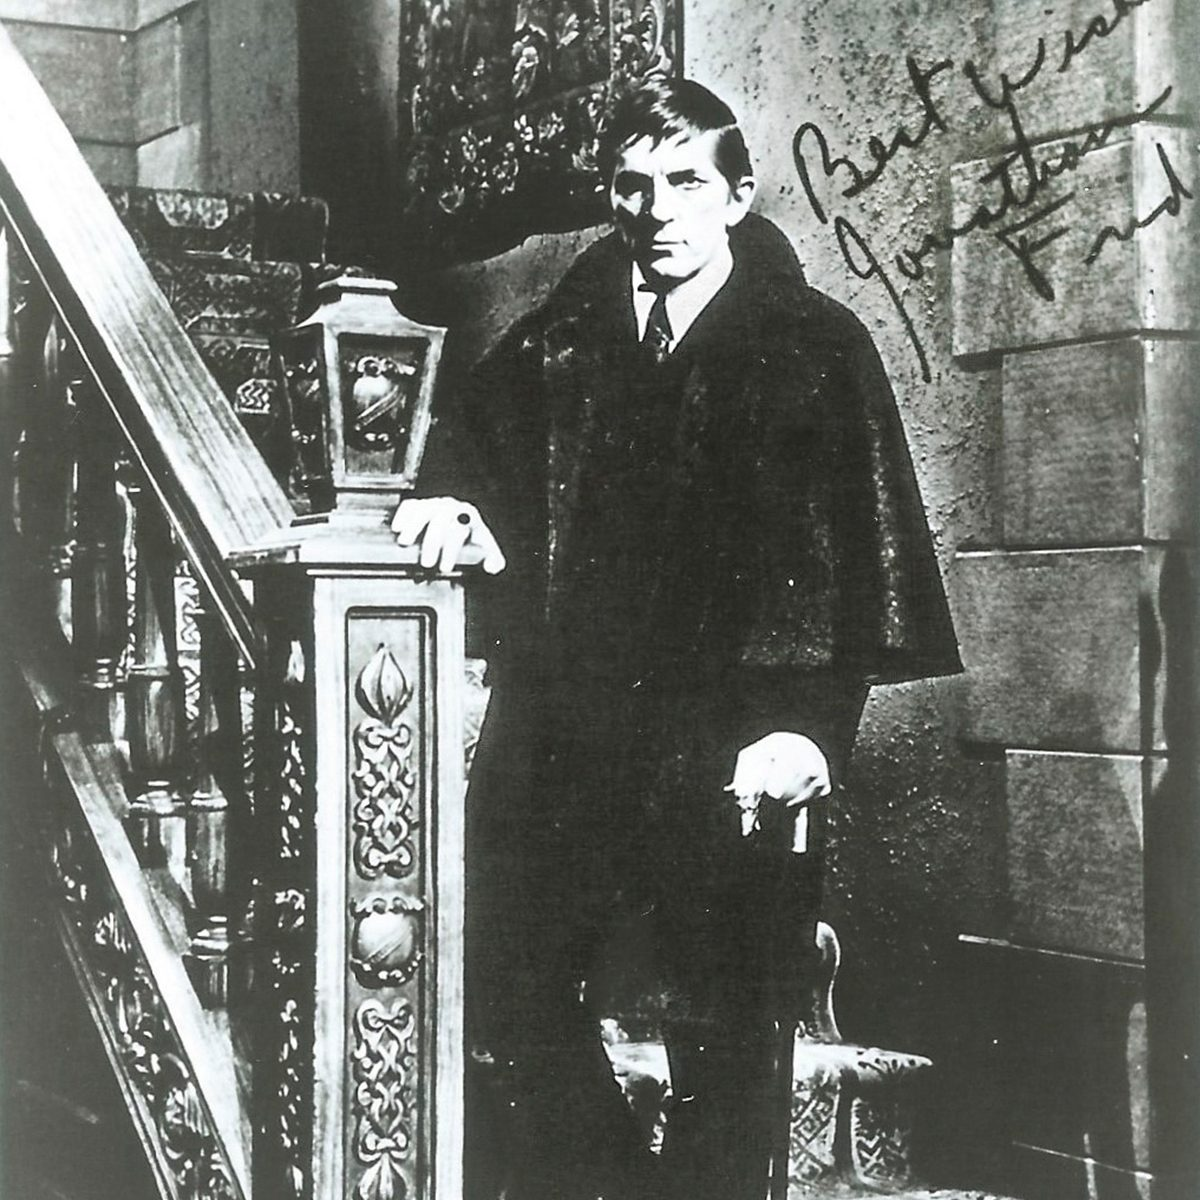 Barnabas Collins fan club photo from Dark Shadows /REM Magazine/2016/10/REMON16_OnScreen_036-038/Links